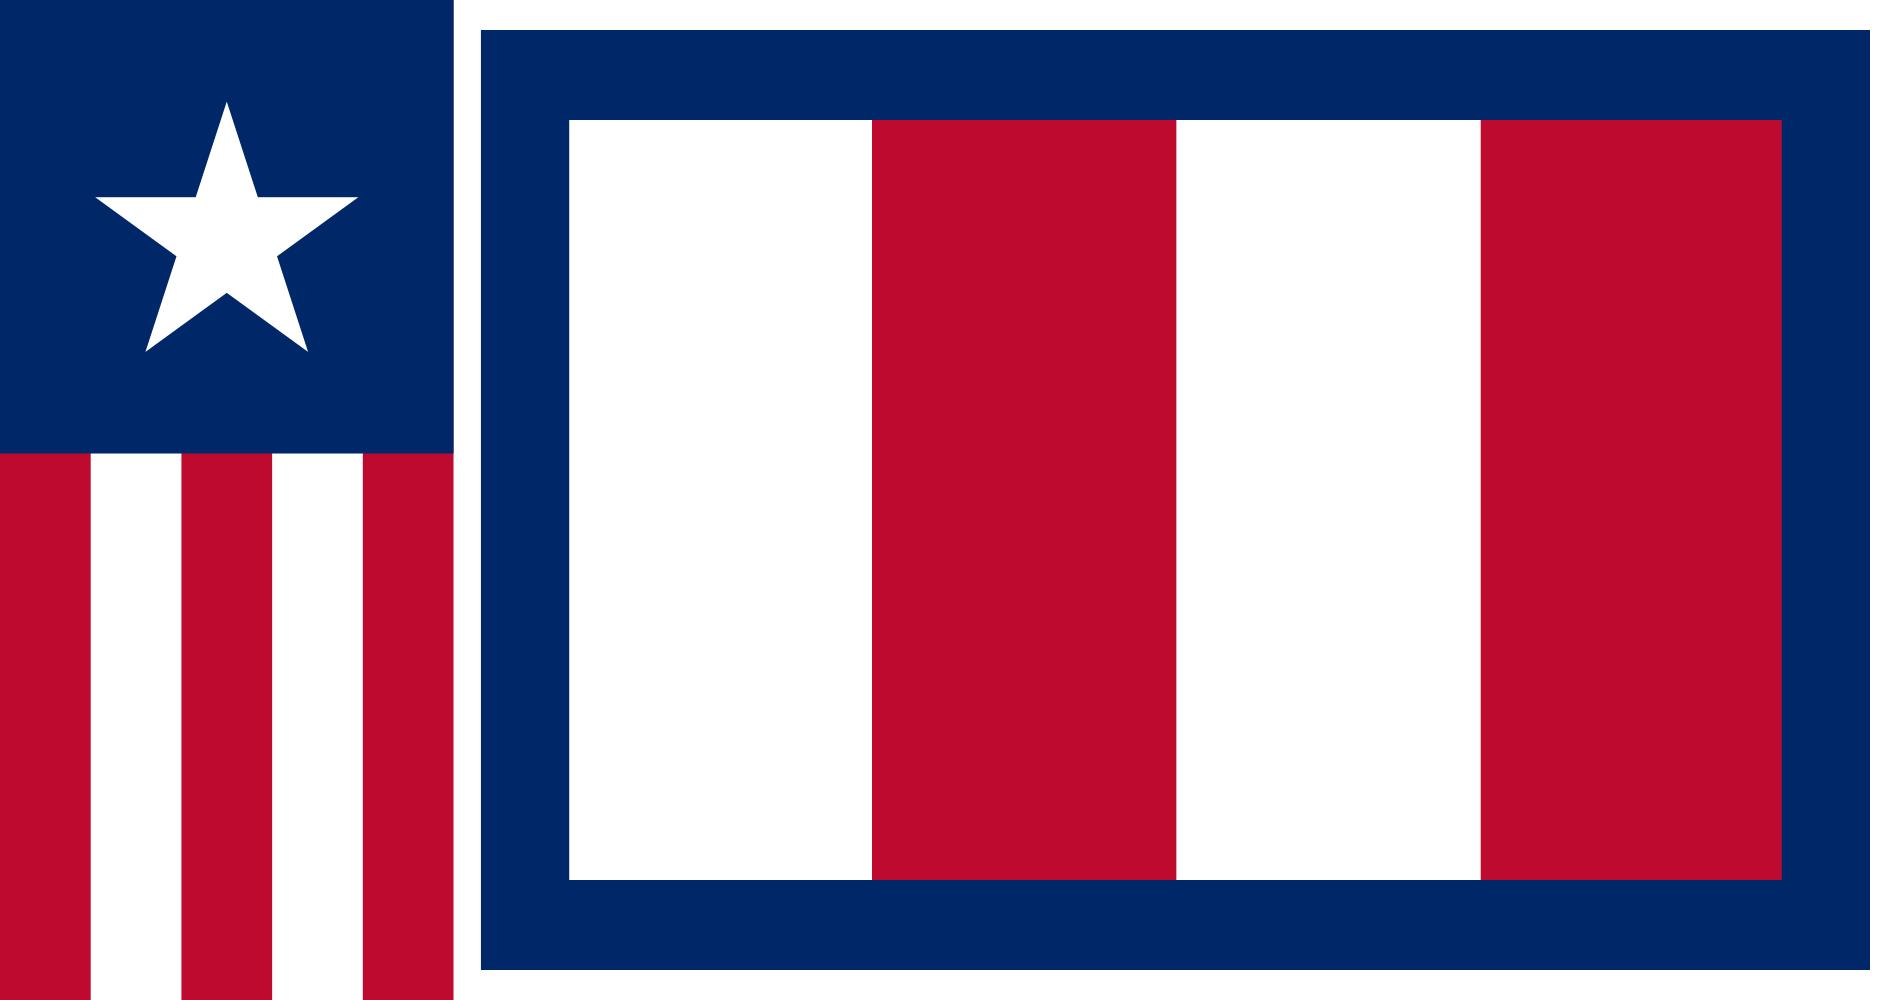 Grand Bassa County (third version)